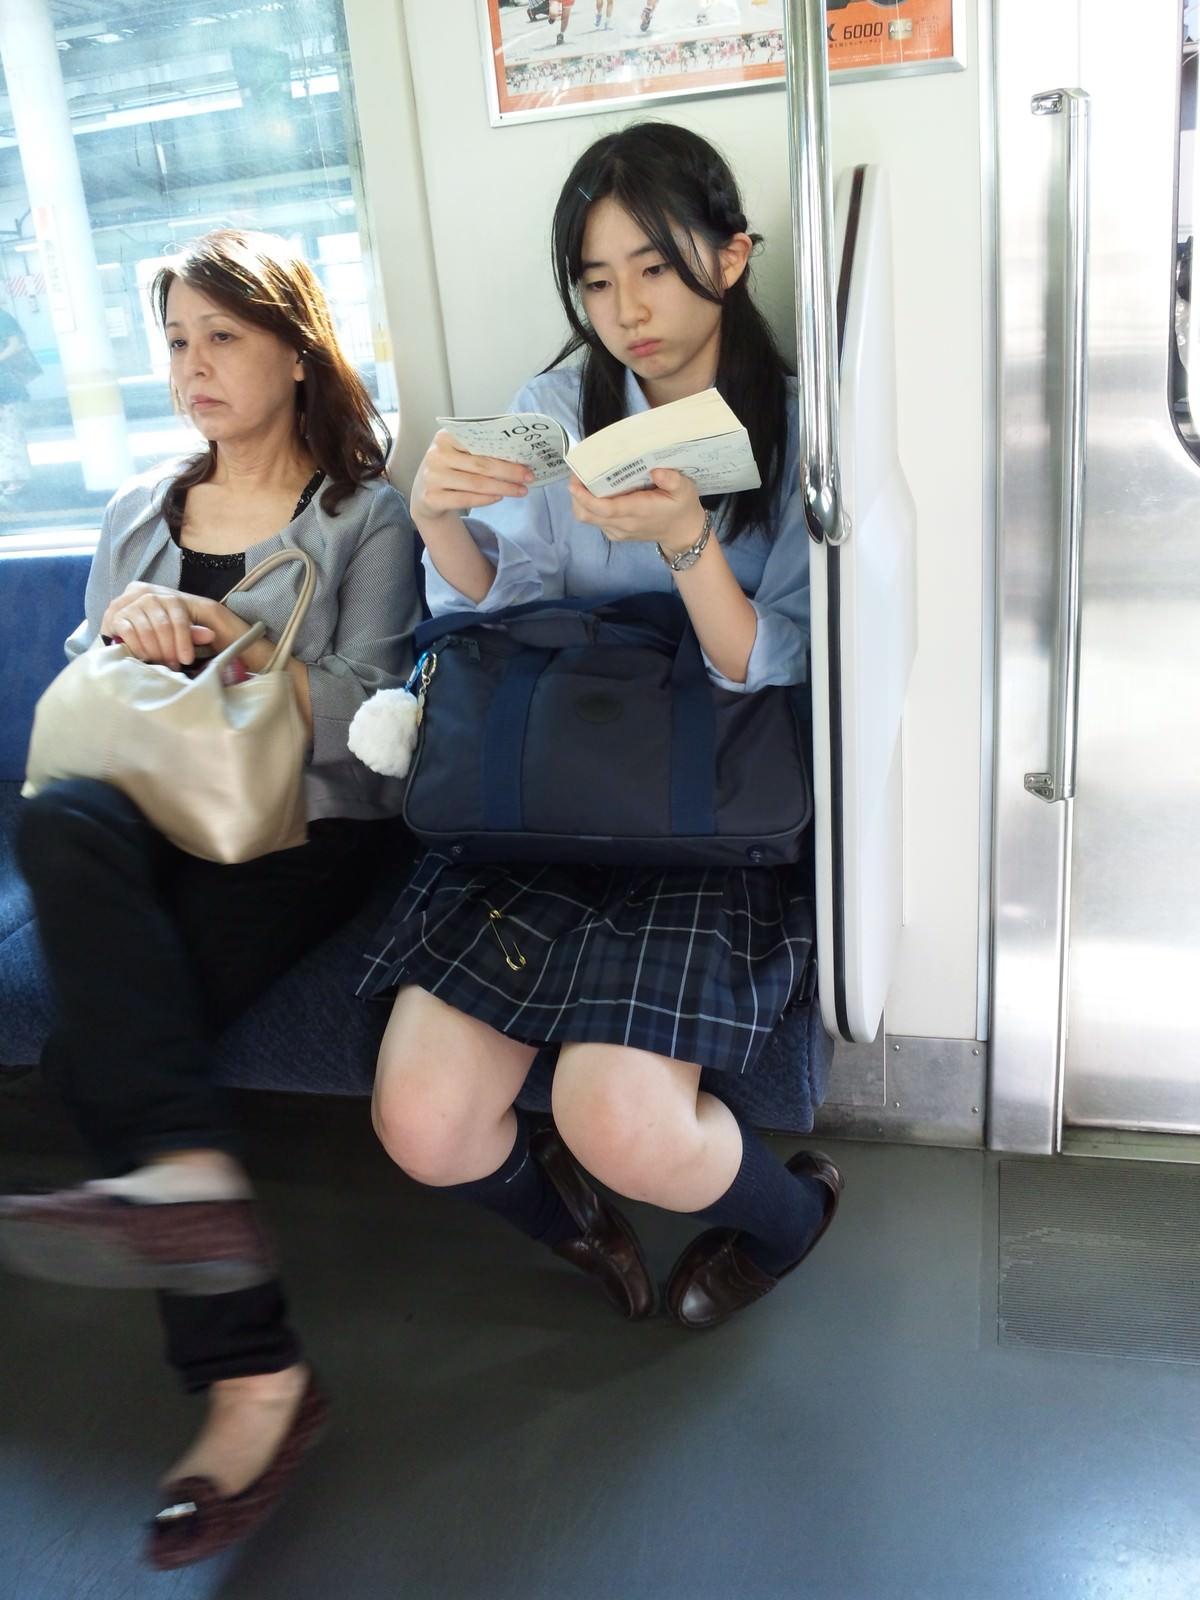 駅や電車で出会った奇跡の素人エロ画像wwwwwwwwwwwwww JphDh1h